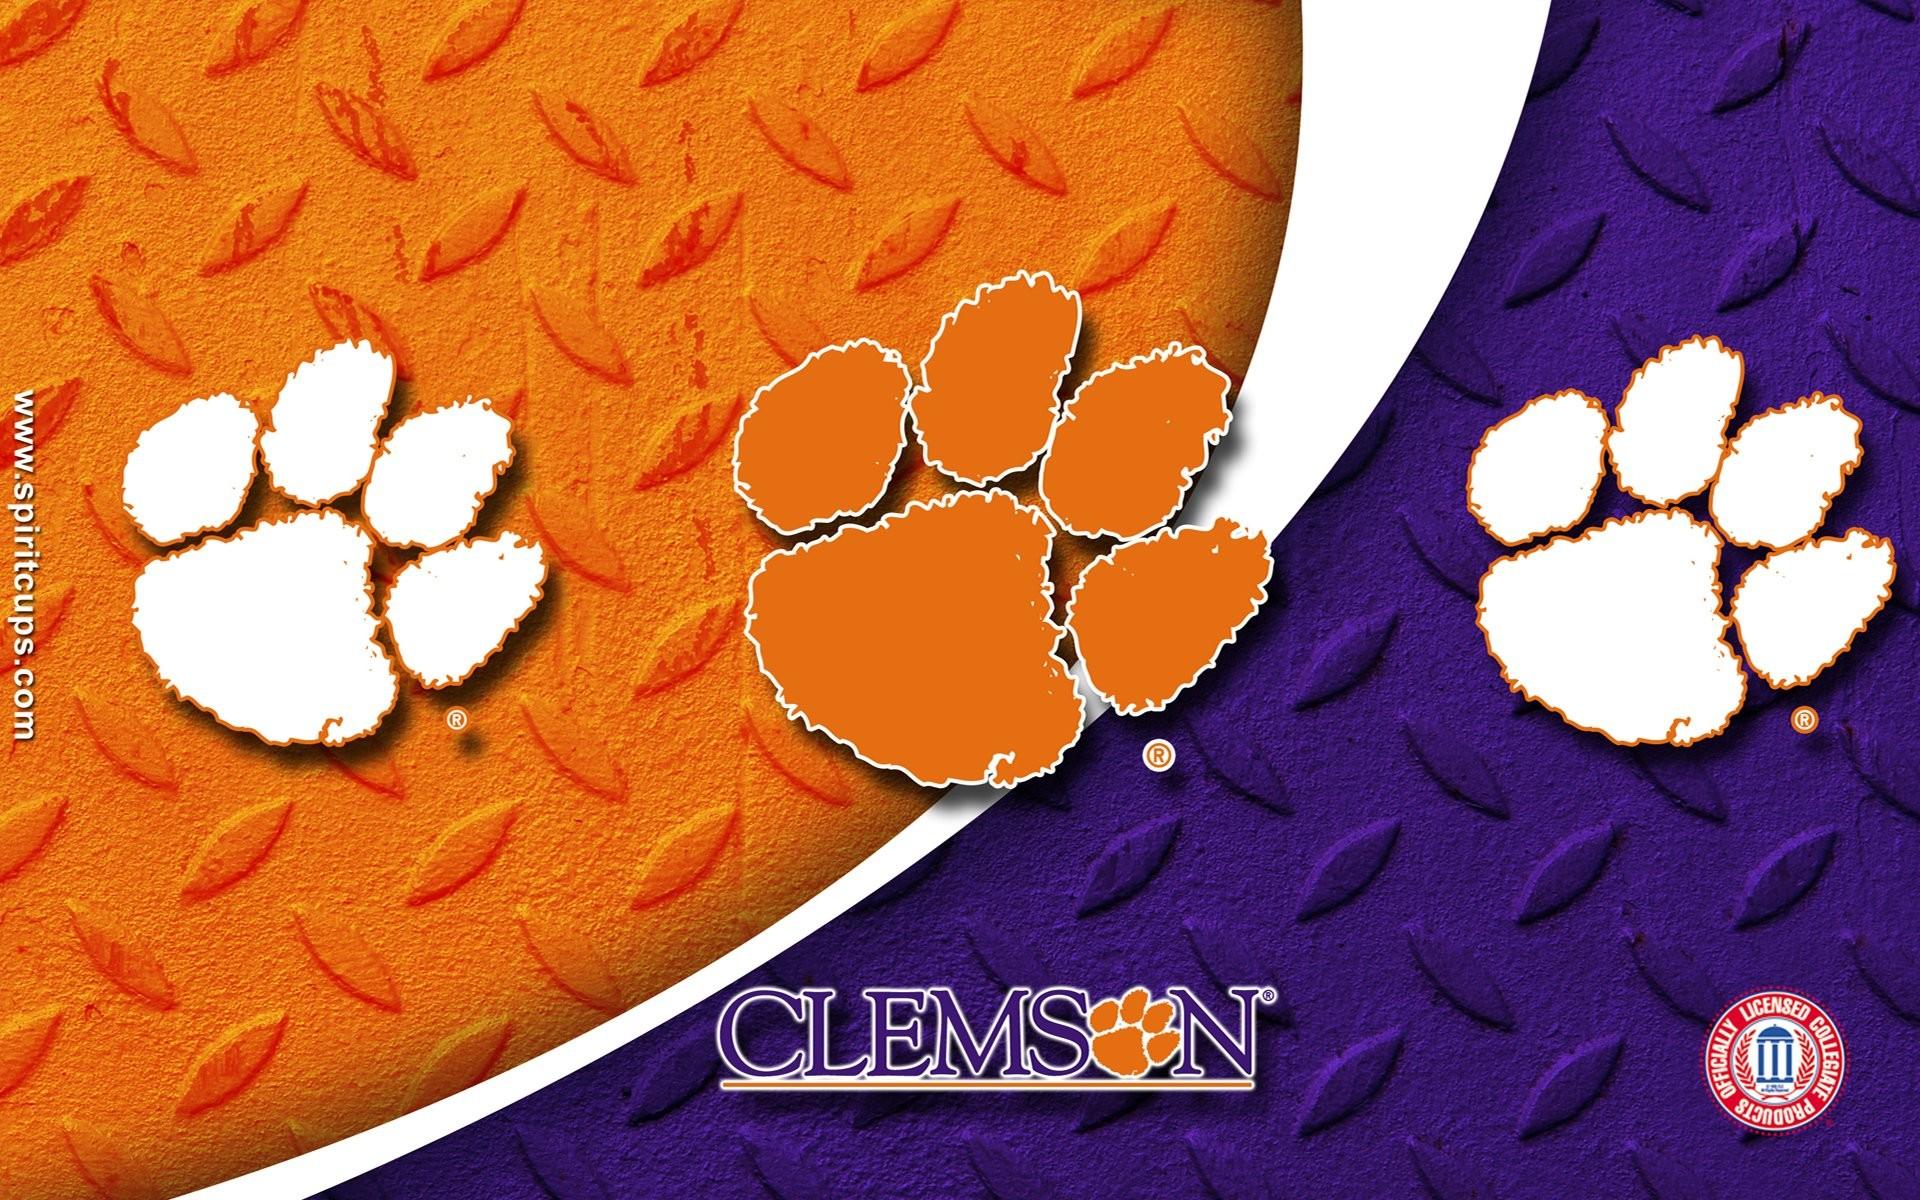 CLEMSON TIGERS college football wallpaper     593971 .